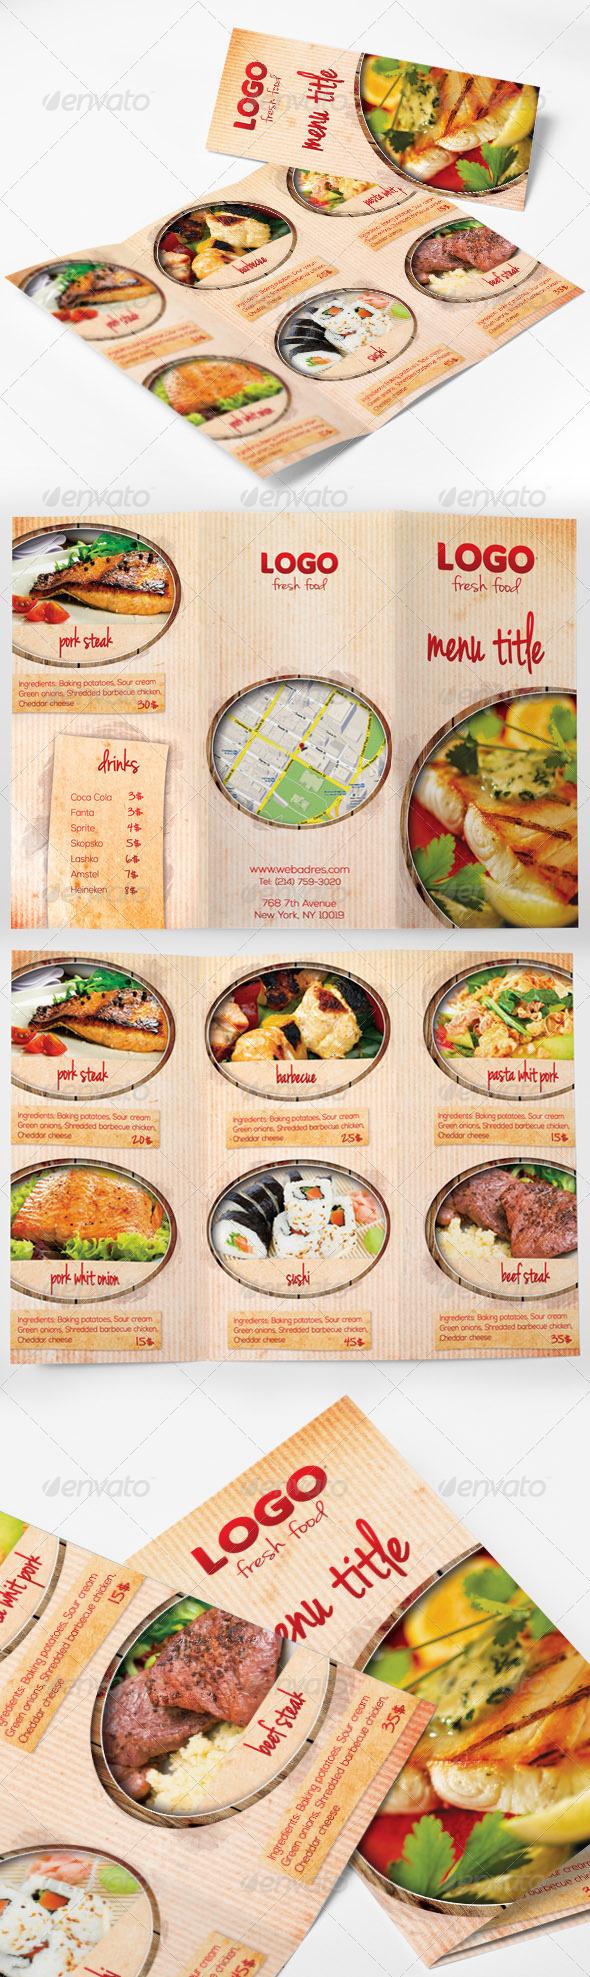 GraphicRiver Food Menu Tri-fold Brochure 4258147